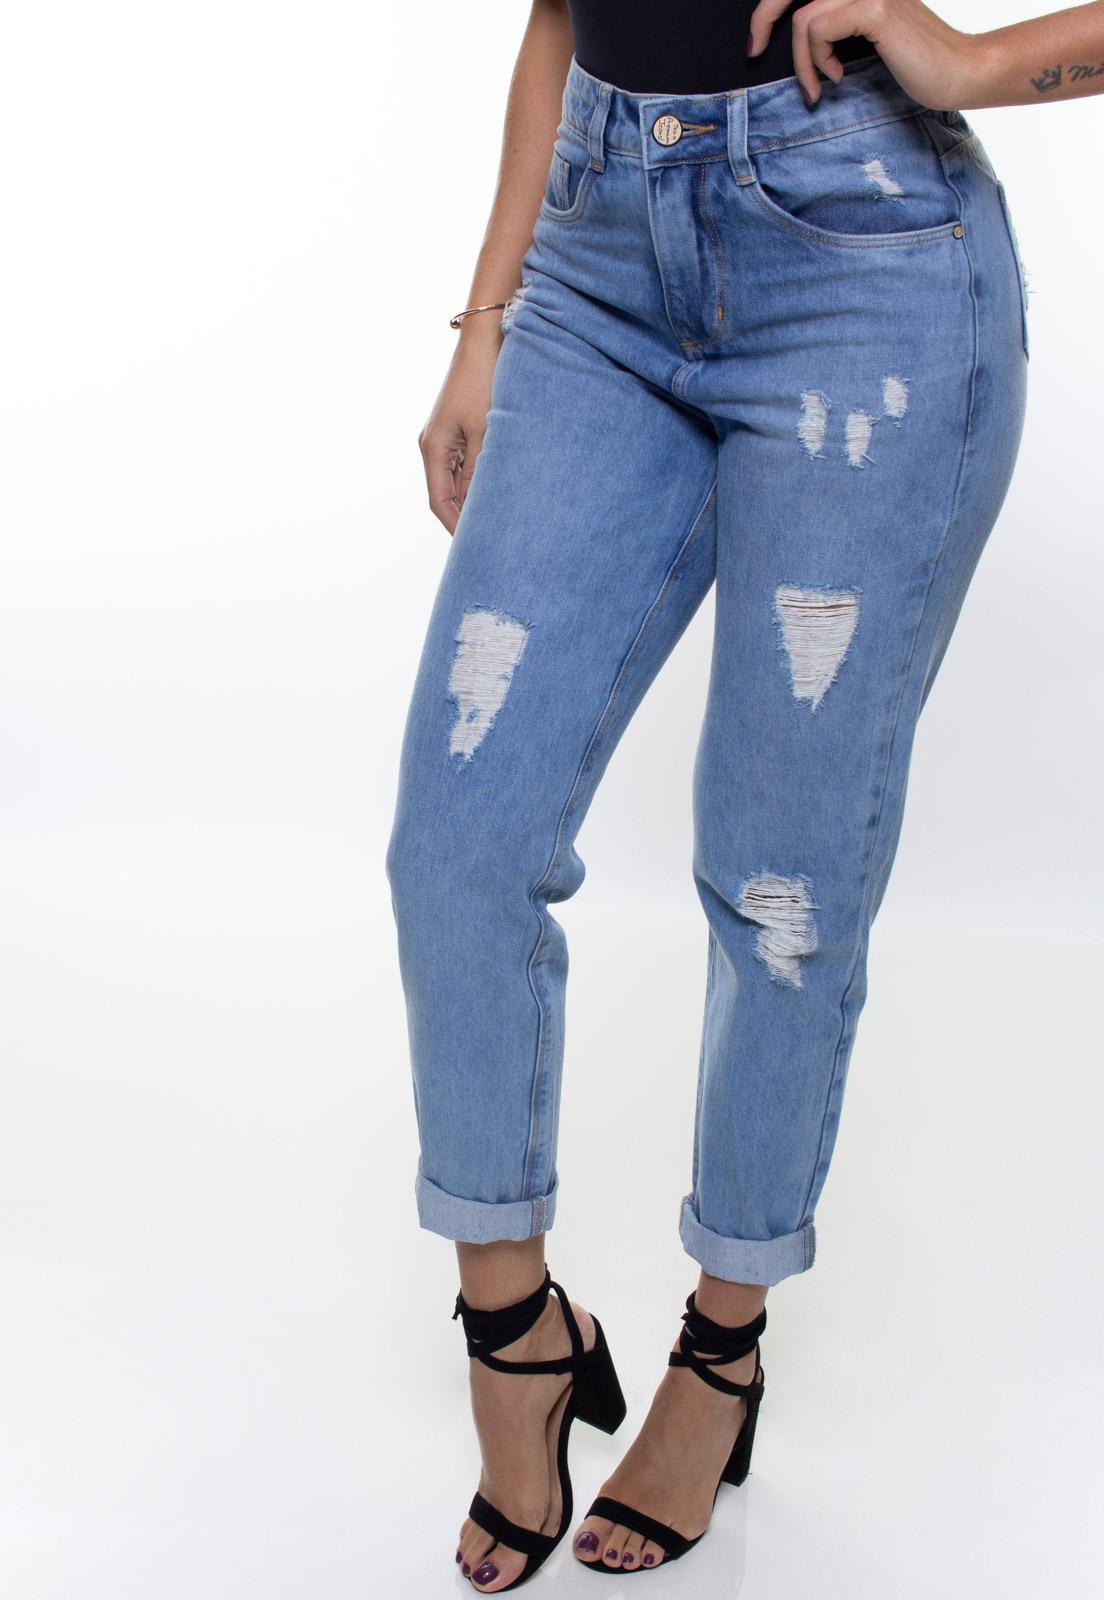 Calça Mom Fit Jeans Feminina Crocker - 48089  - CROCKER JEANS